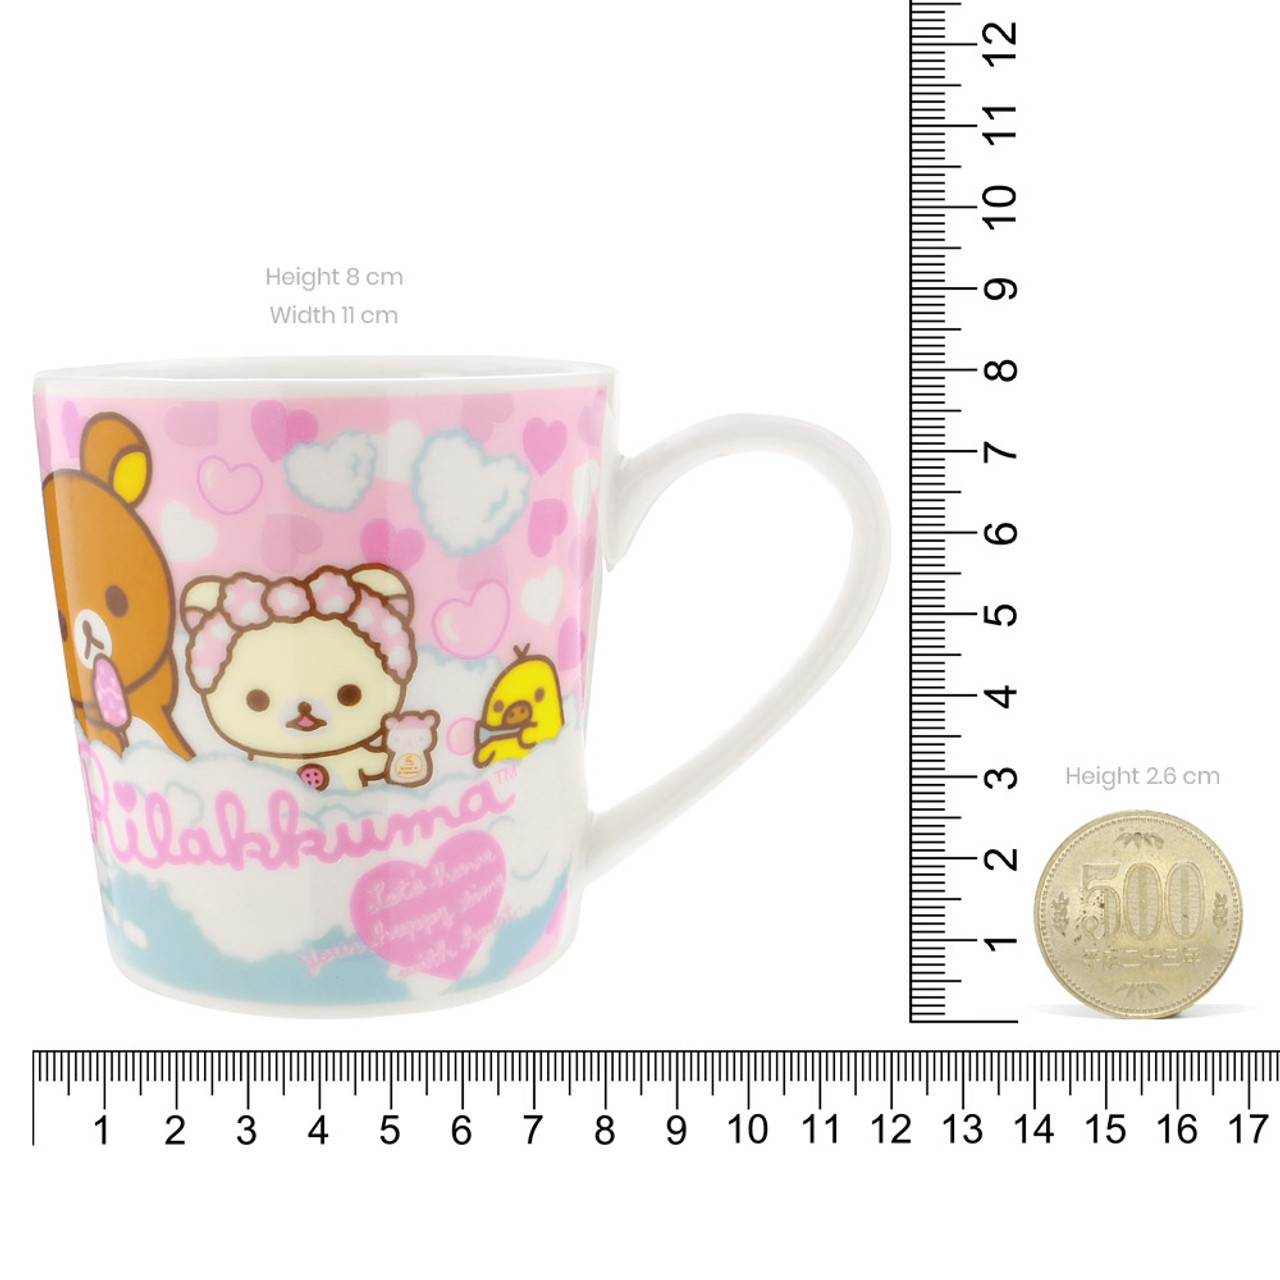 San-x Rilakkuma Bath Time Light Pink Ceramic Mug - Heart ( Proportion )